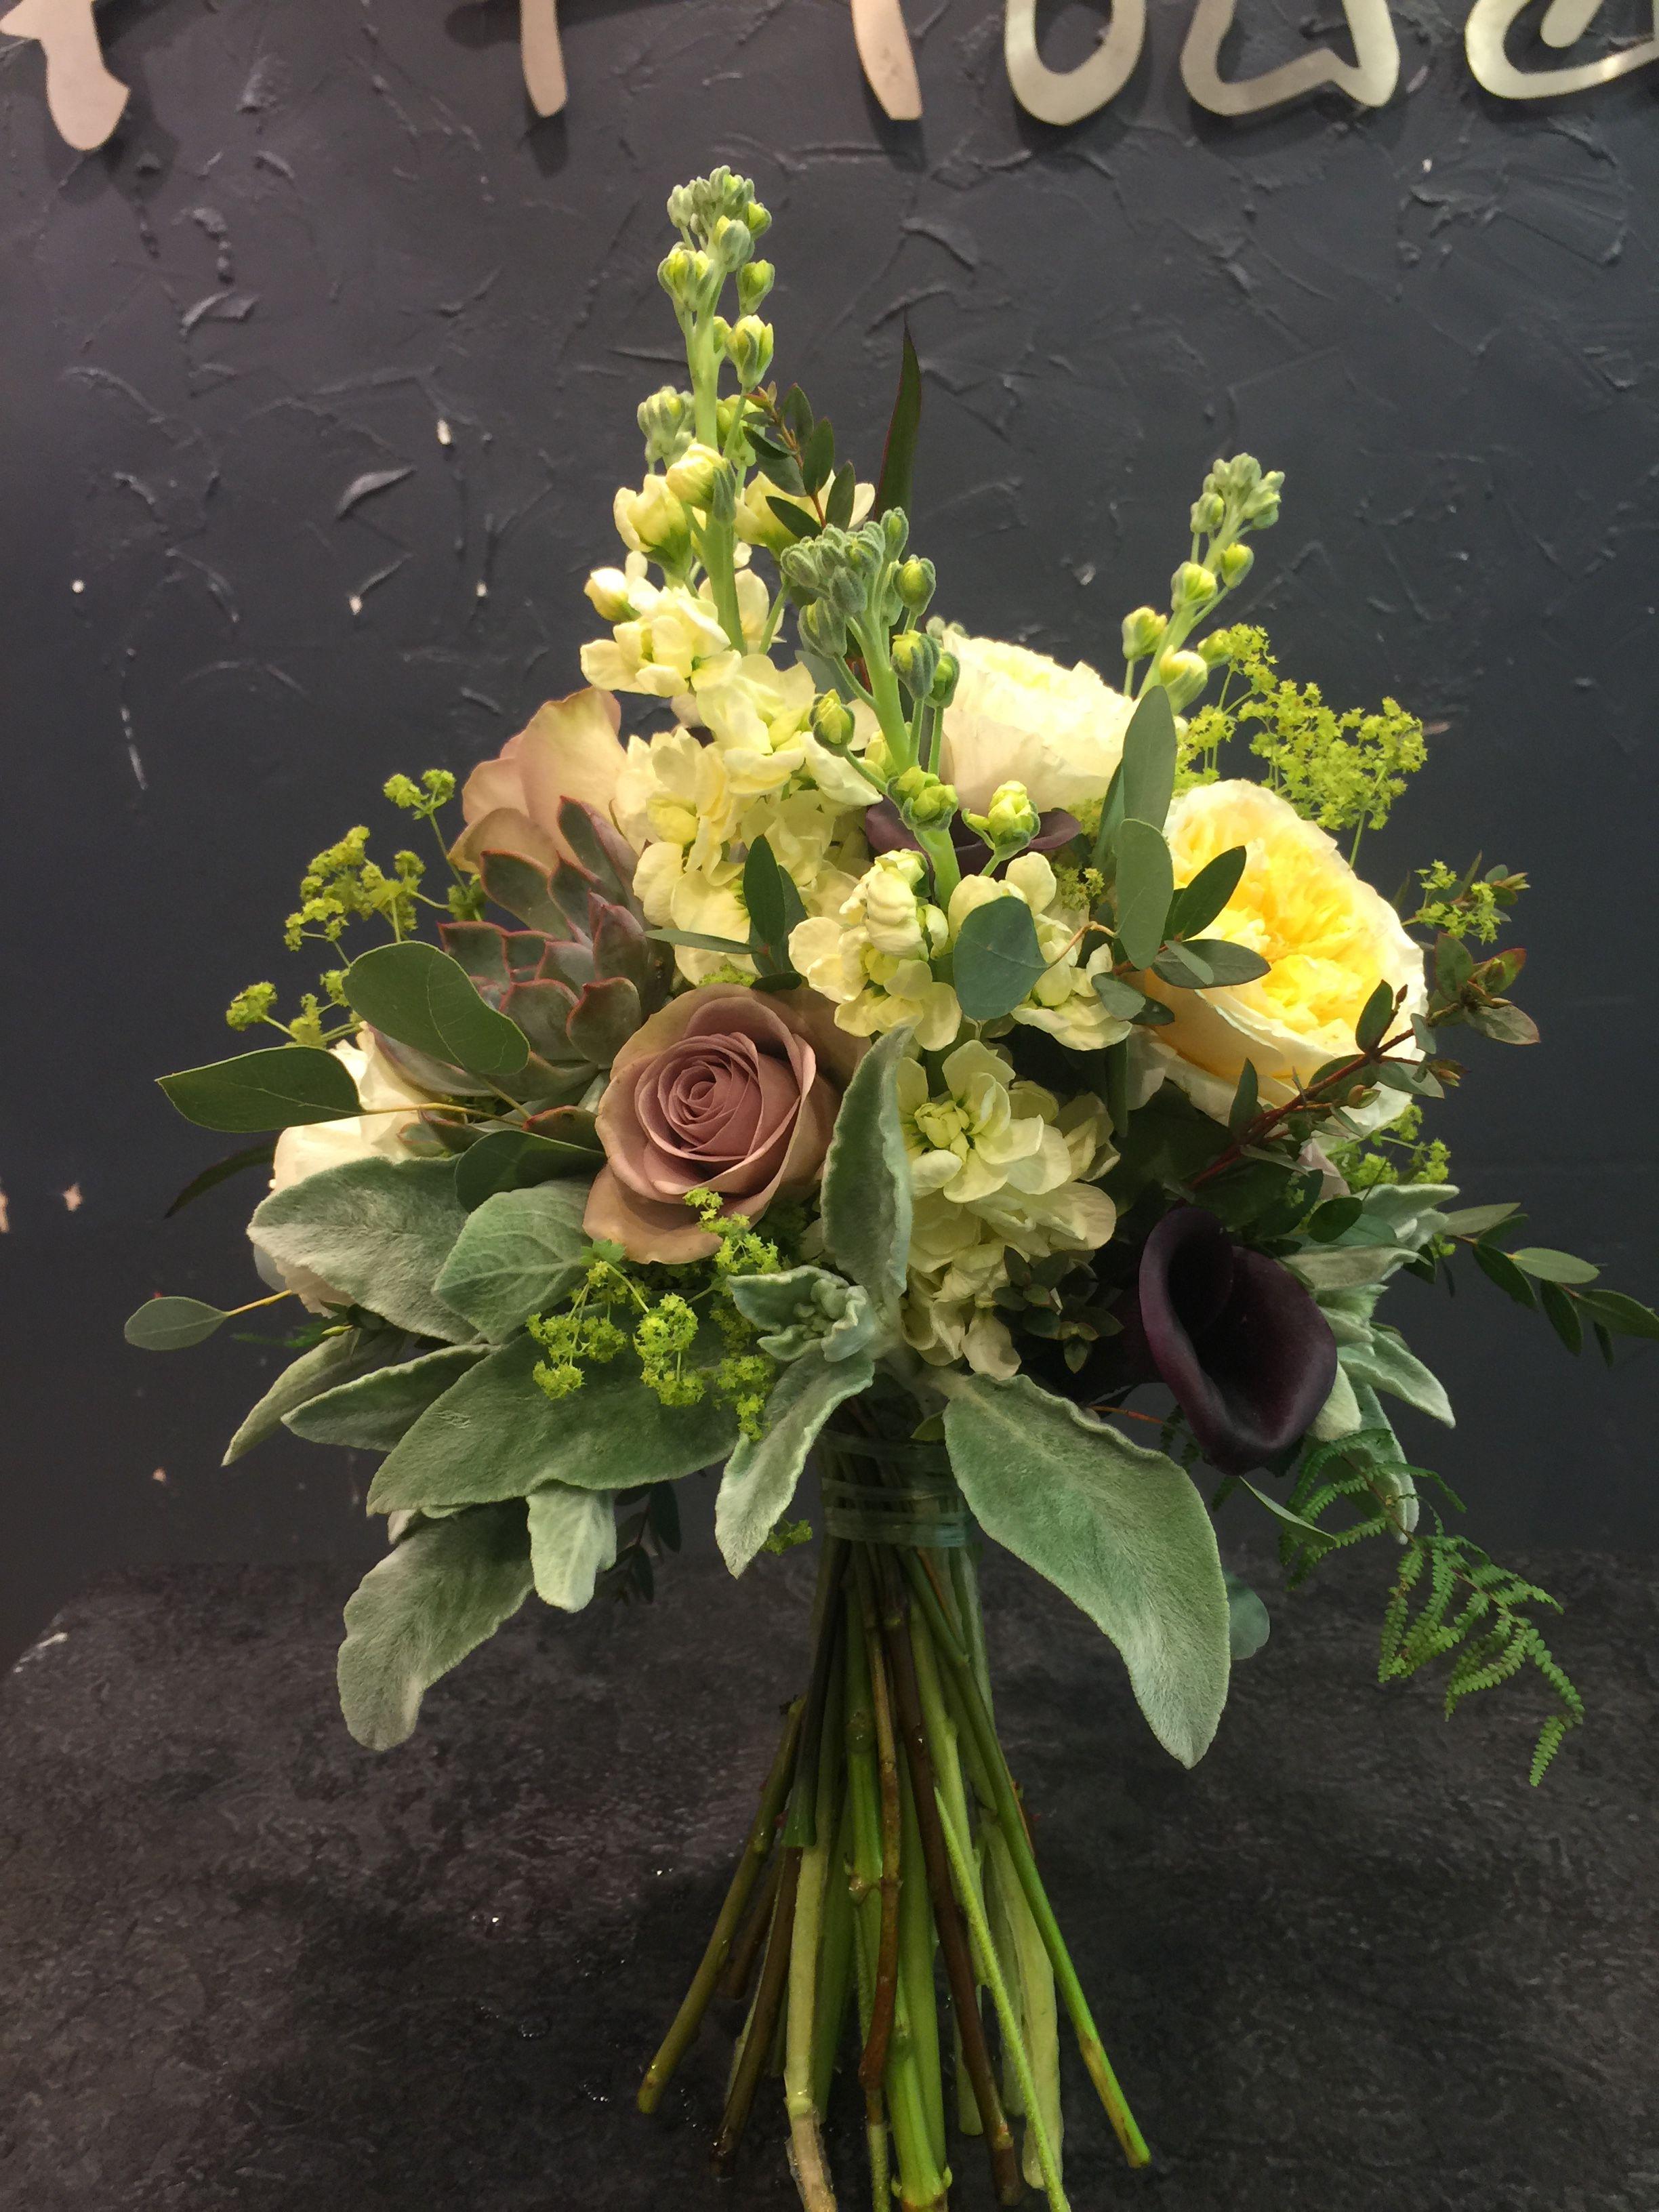 Fabulous Bridal bouquet with Amnesia&Peach Juliet roses, hydrangea, burgundy calla lilies, matthiola, succulent, alchemilla mollis, eucalyptus, lams ear.